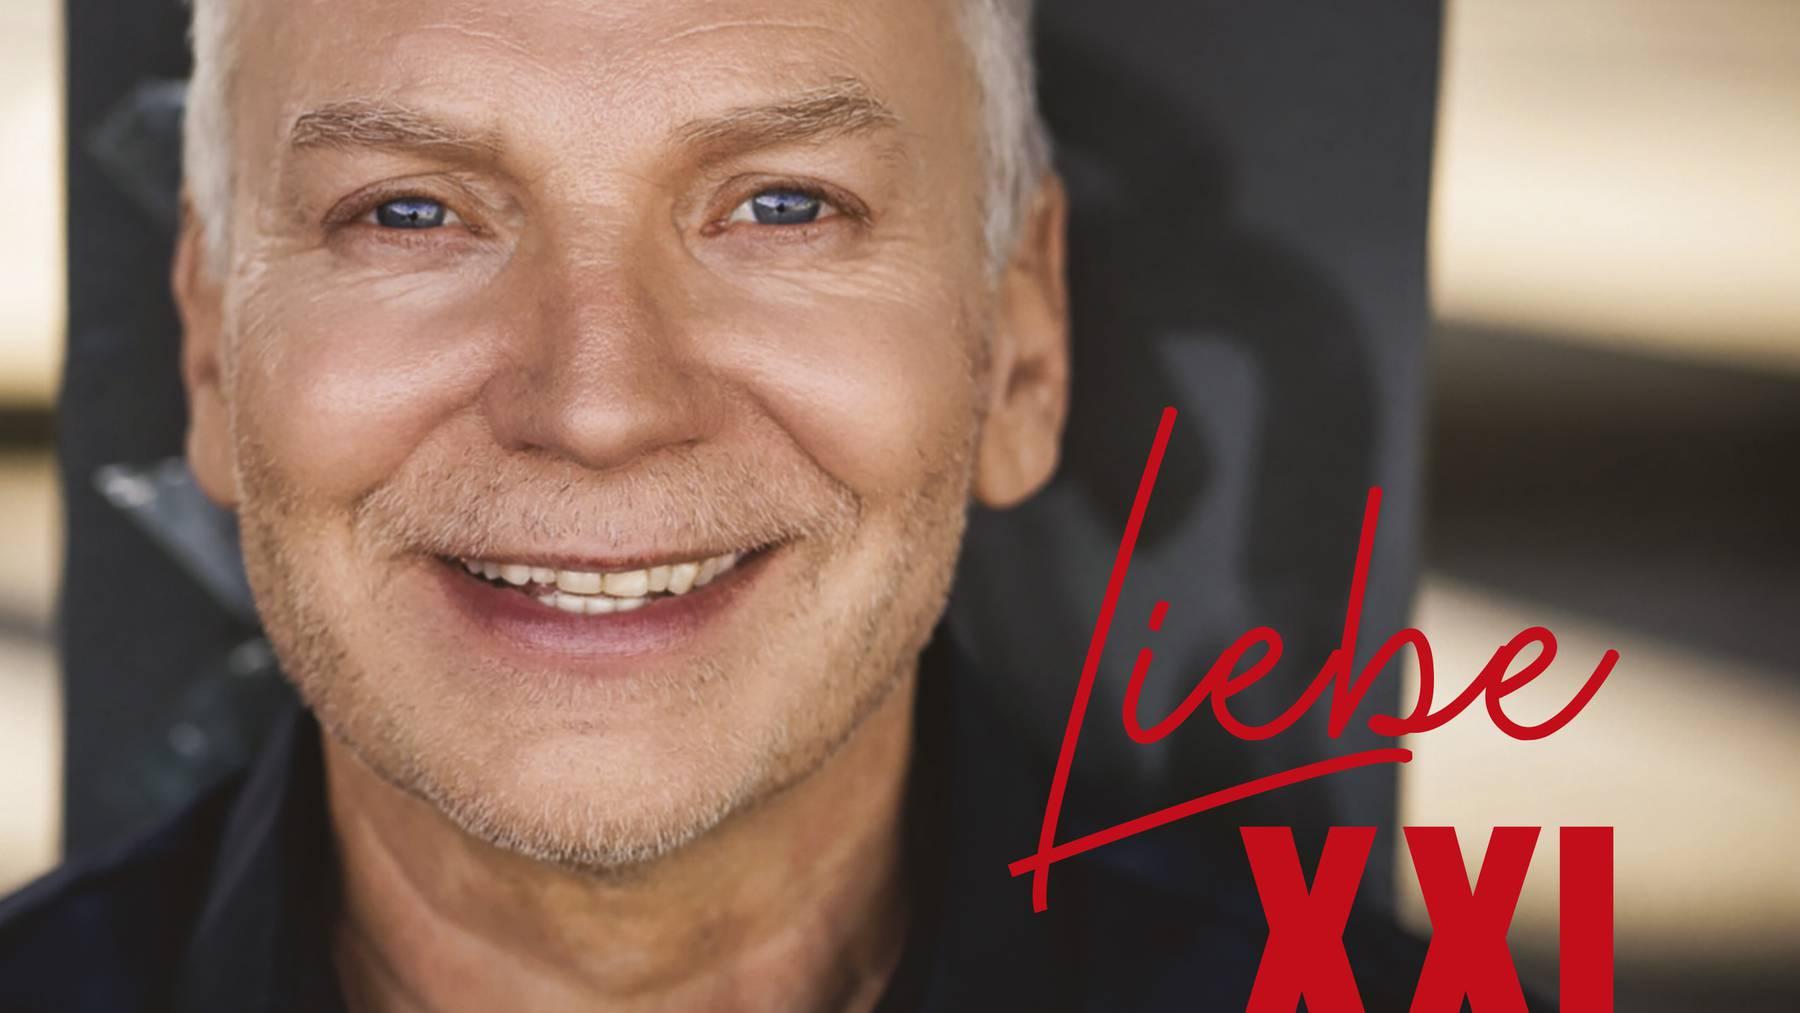 Andreas Zaron - Liebe XXL